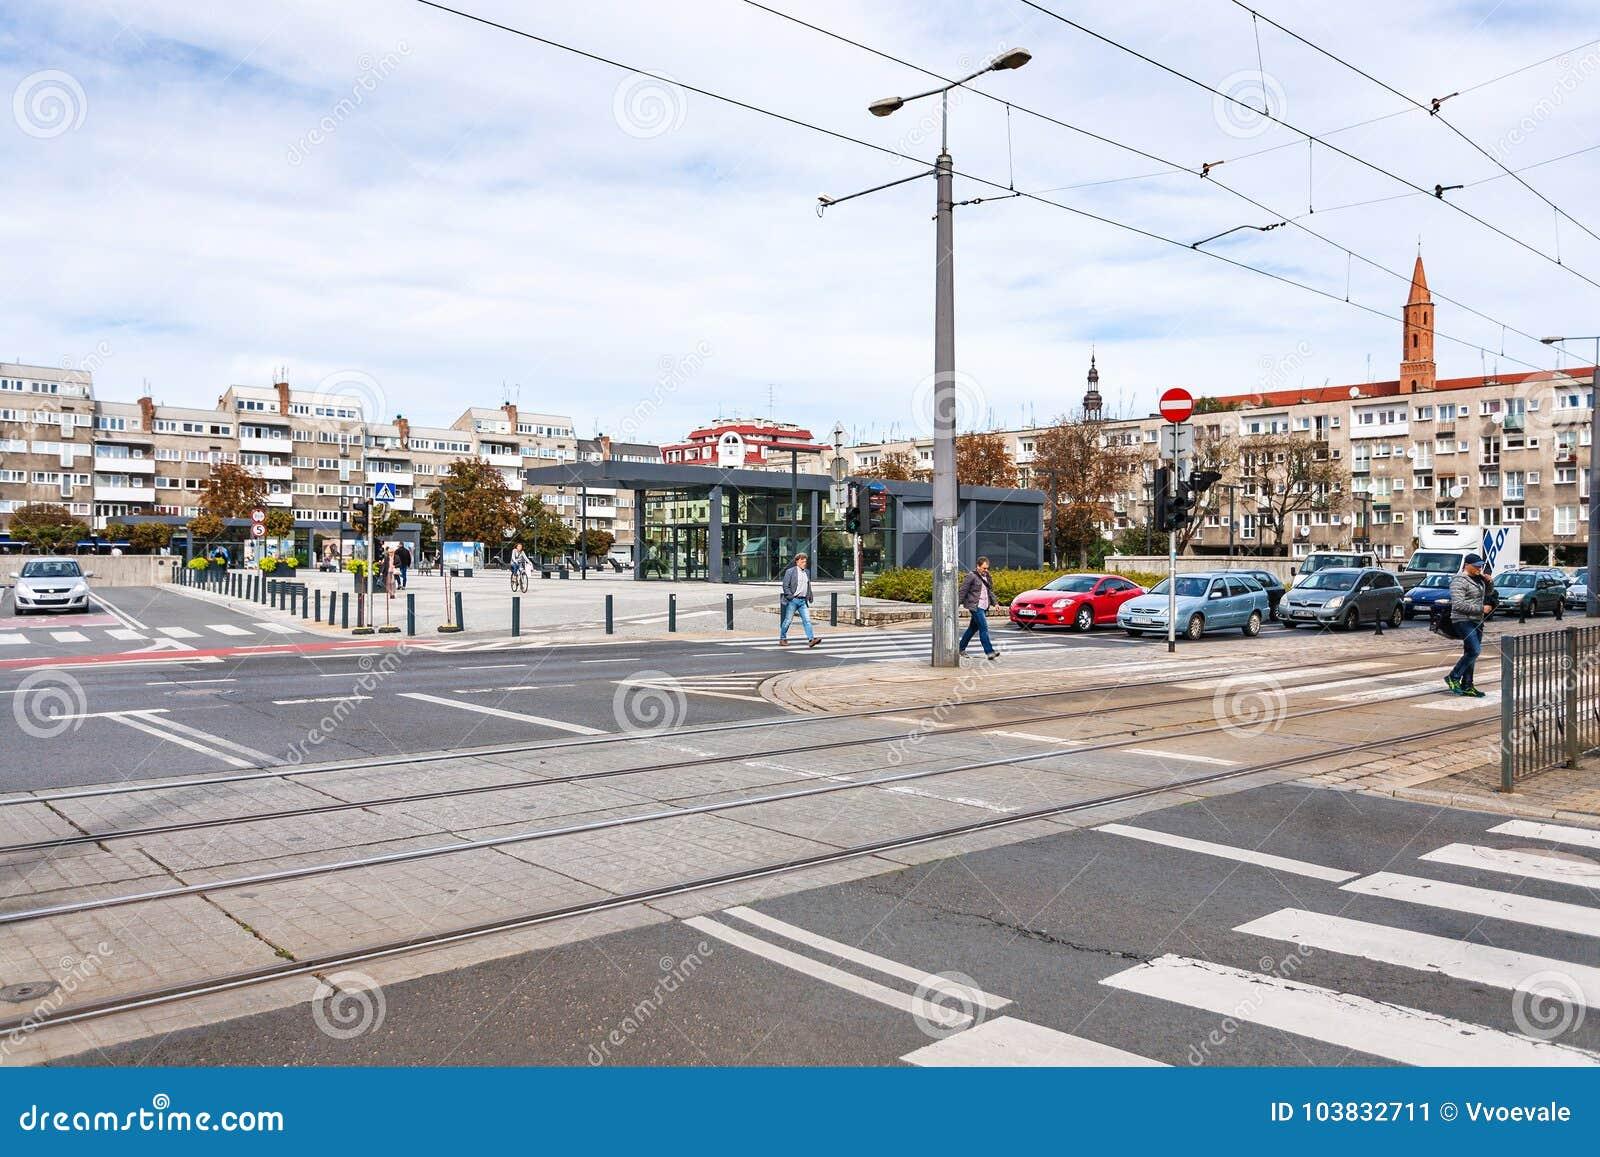 Люди на Plac Nowy Targ придают квадратную форму в городе Wroclaw